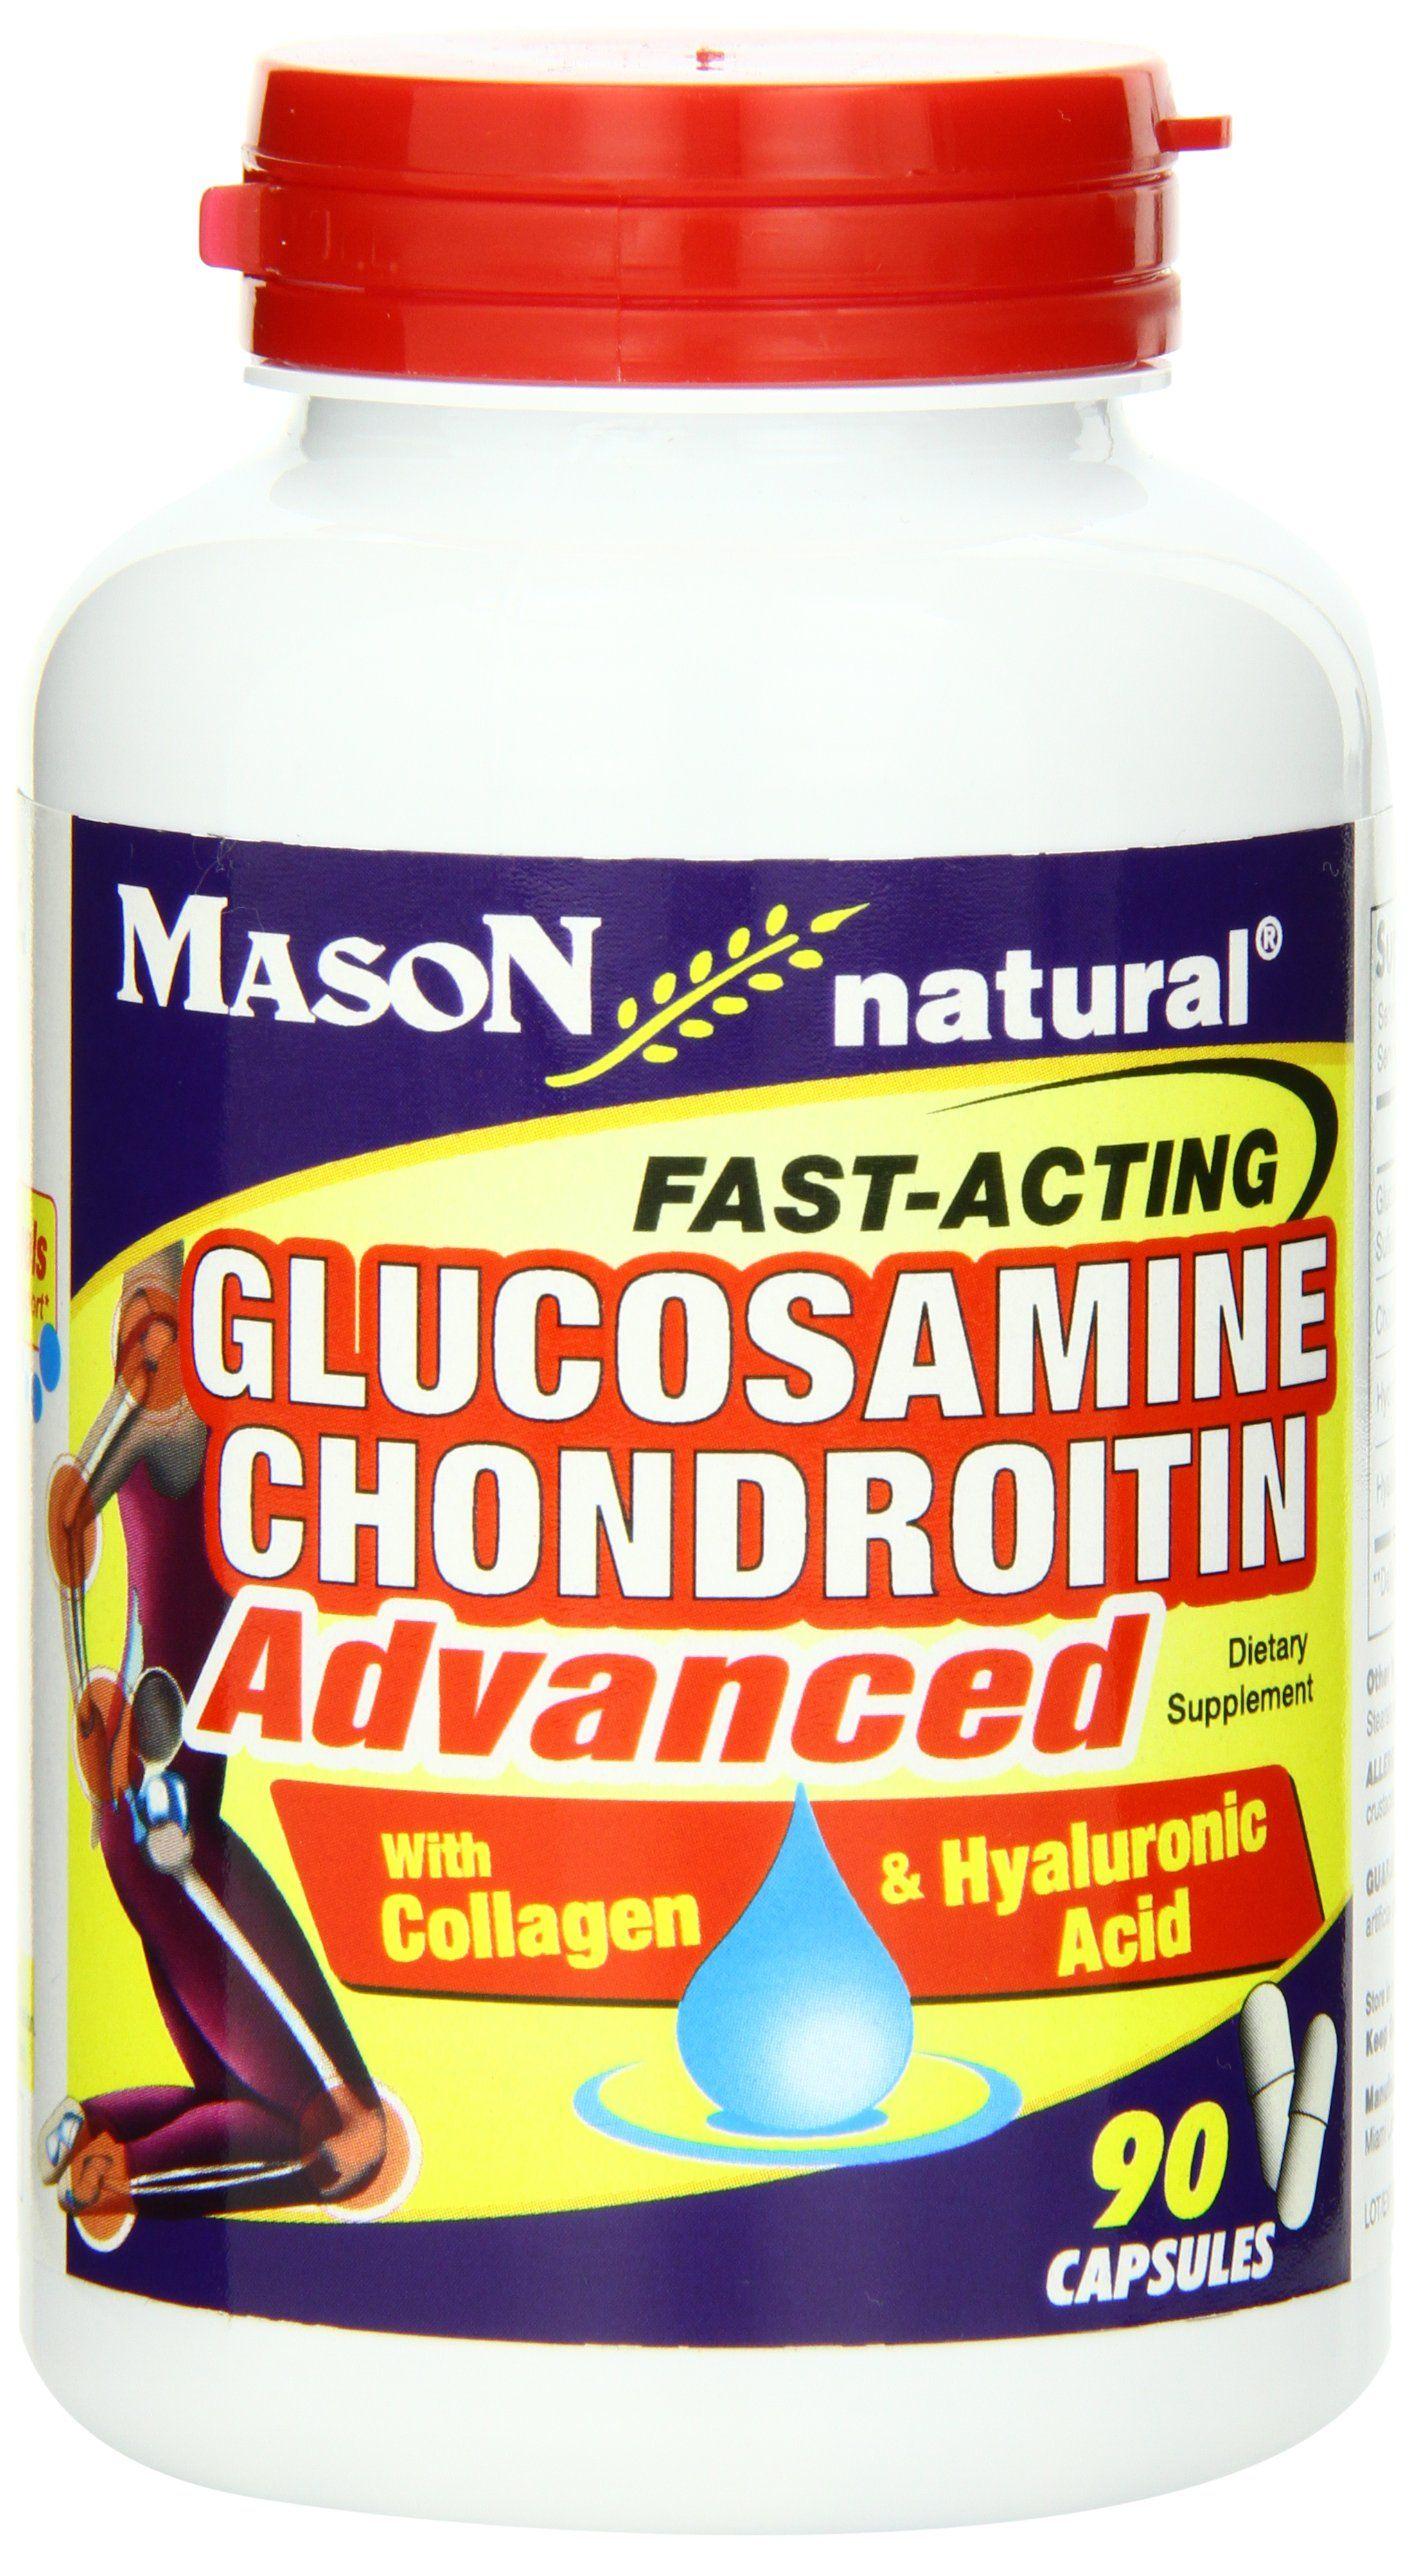 Mason natural glucosamine chondroitin 90 capsules dietary